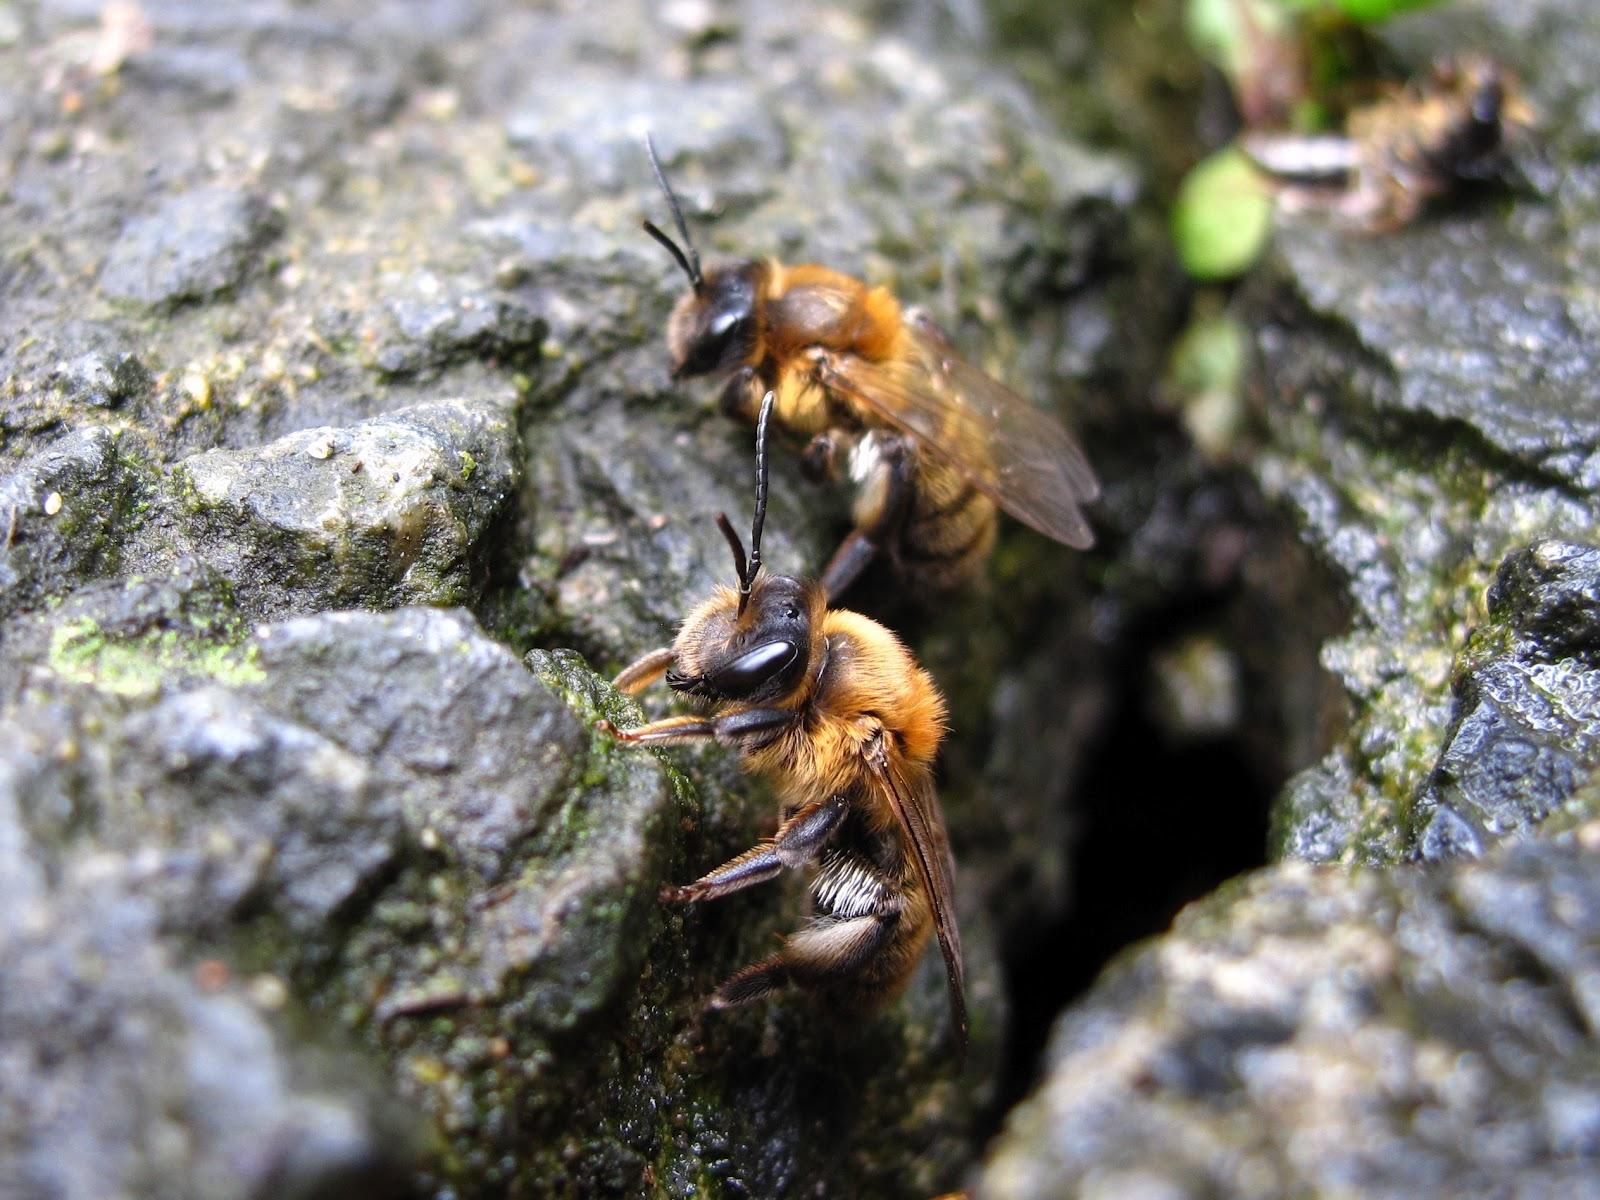 Bugblog Communal Mining Bees